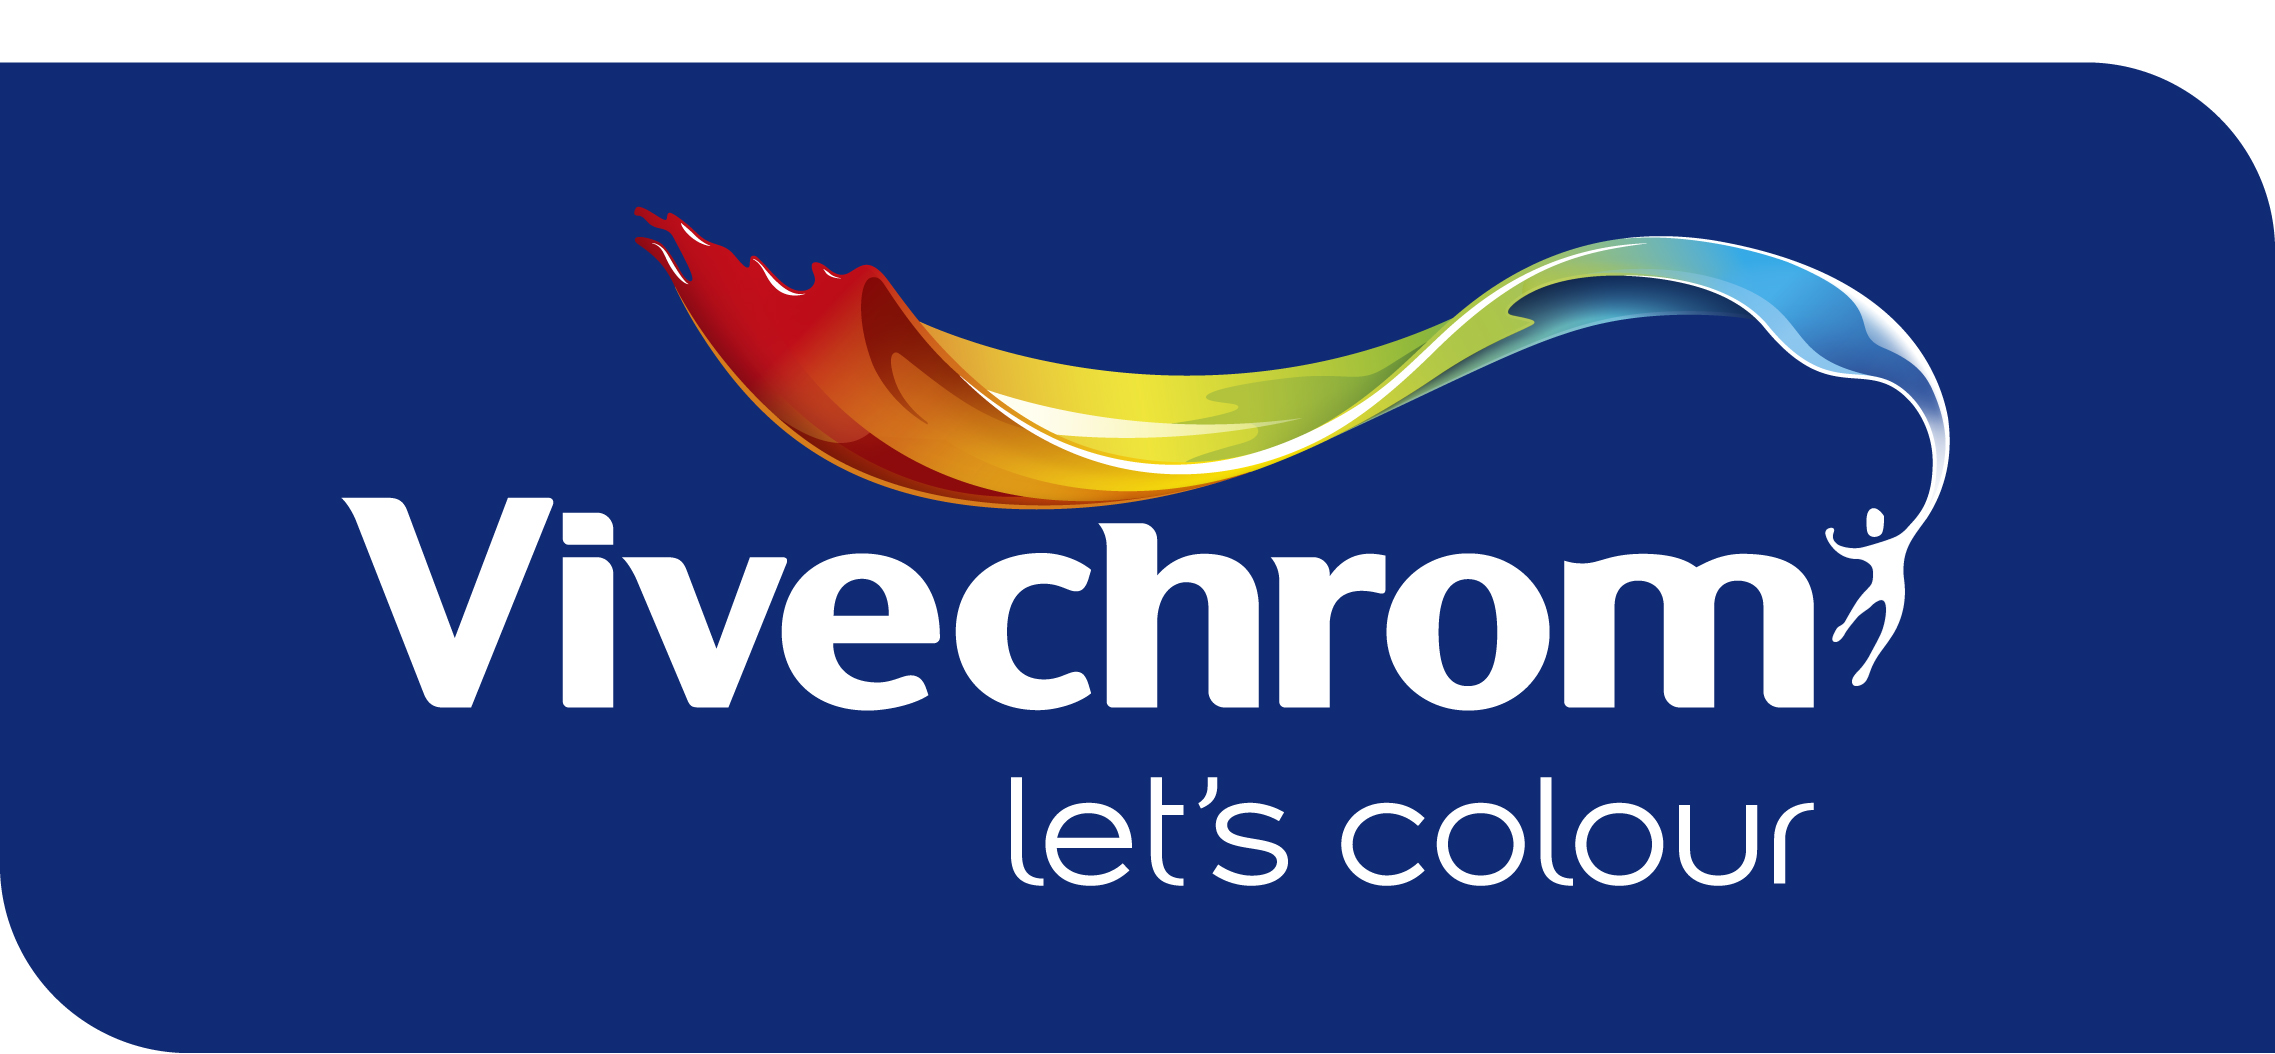 Vivechrom: Δέσμευση στην Ελλάδα - Νέα εταιρική ταυτότητα